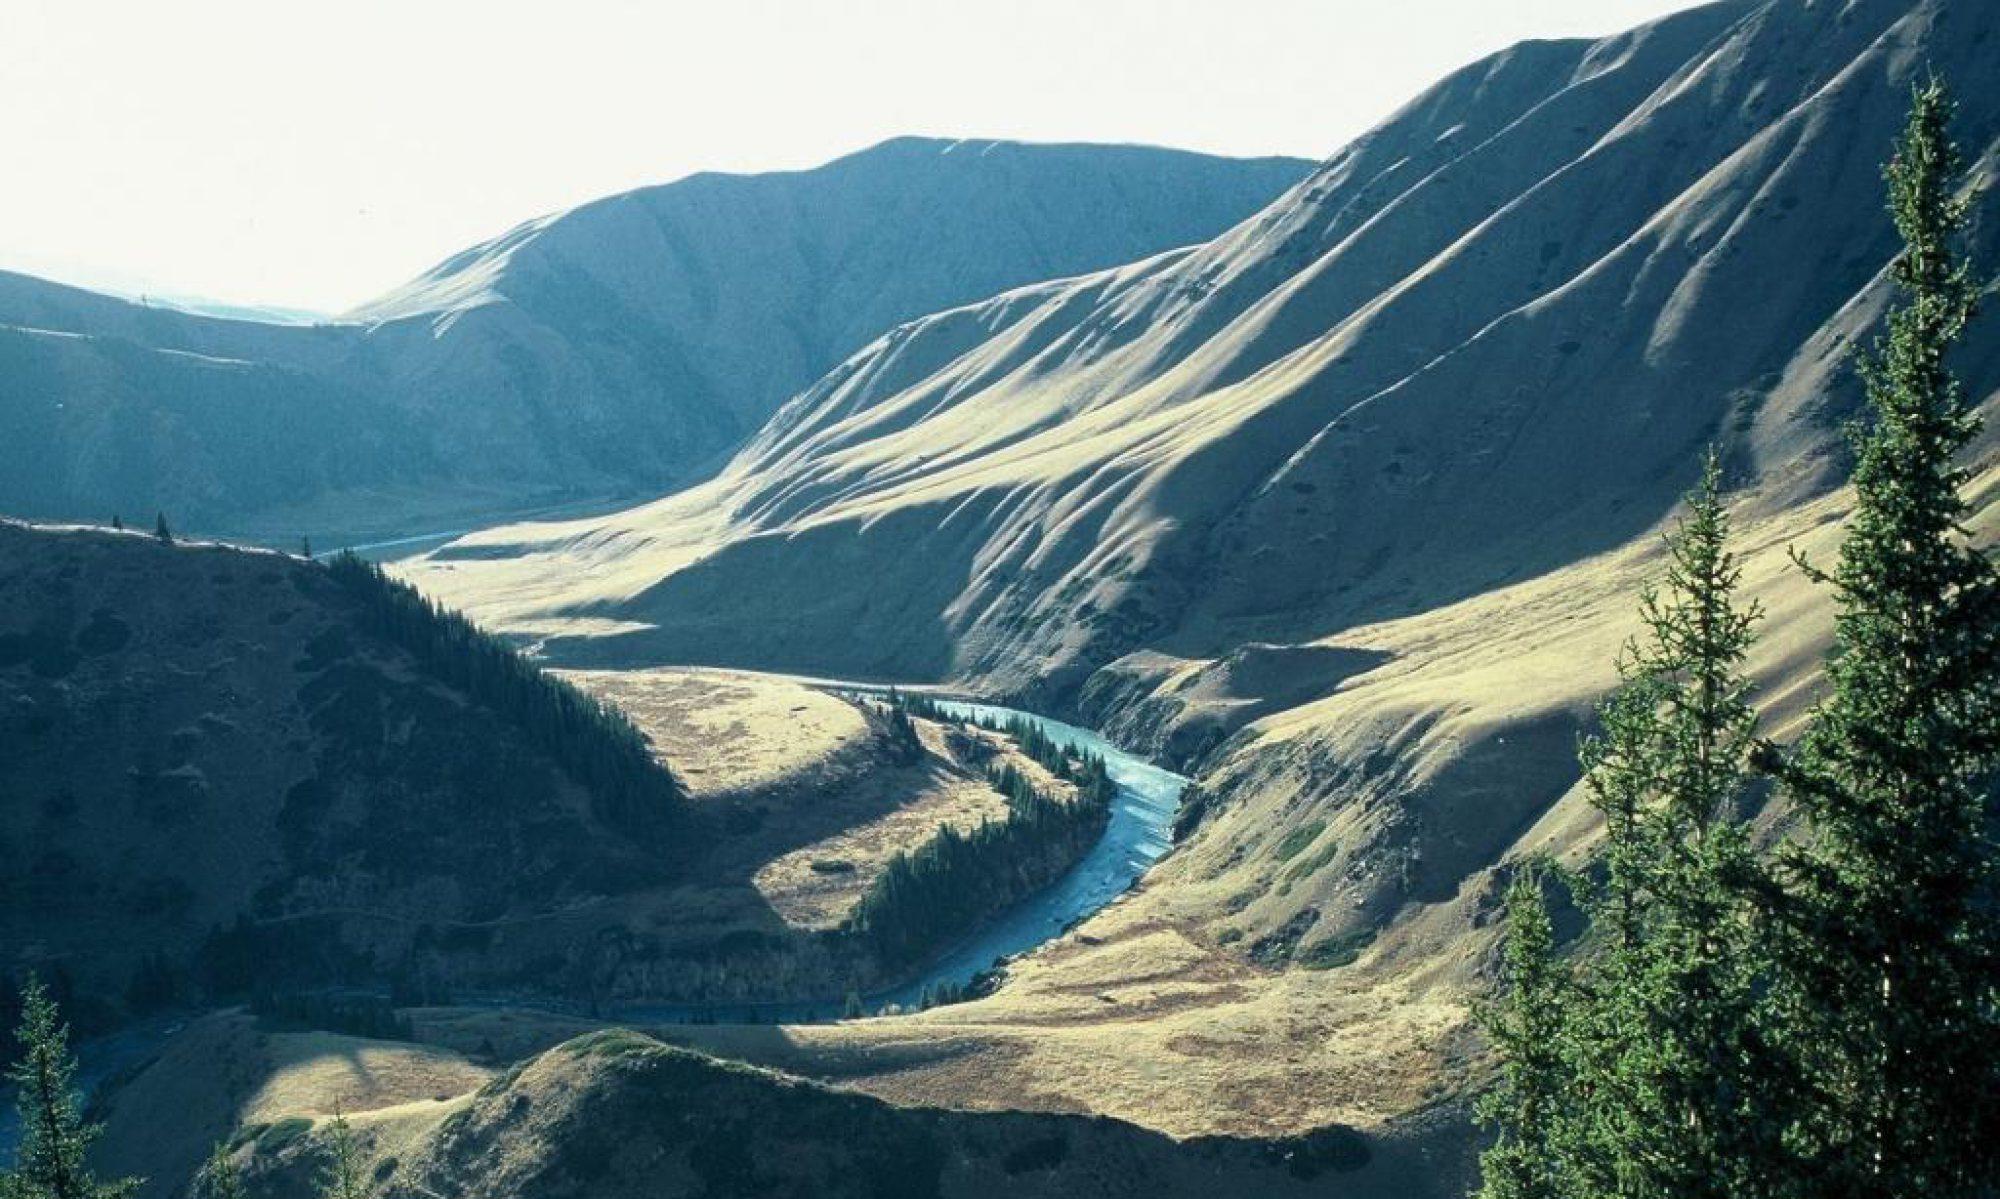 WILDLIFE EXPEDITIONS KYRGYZSTAN